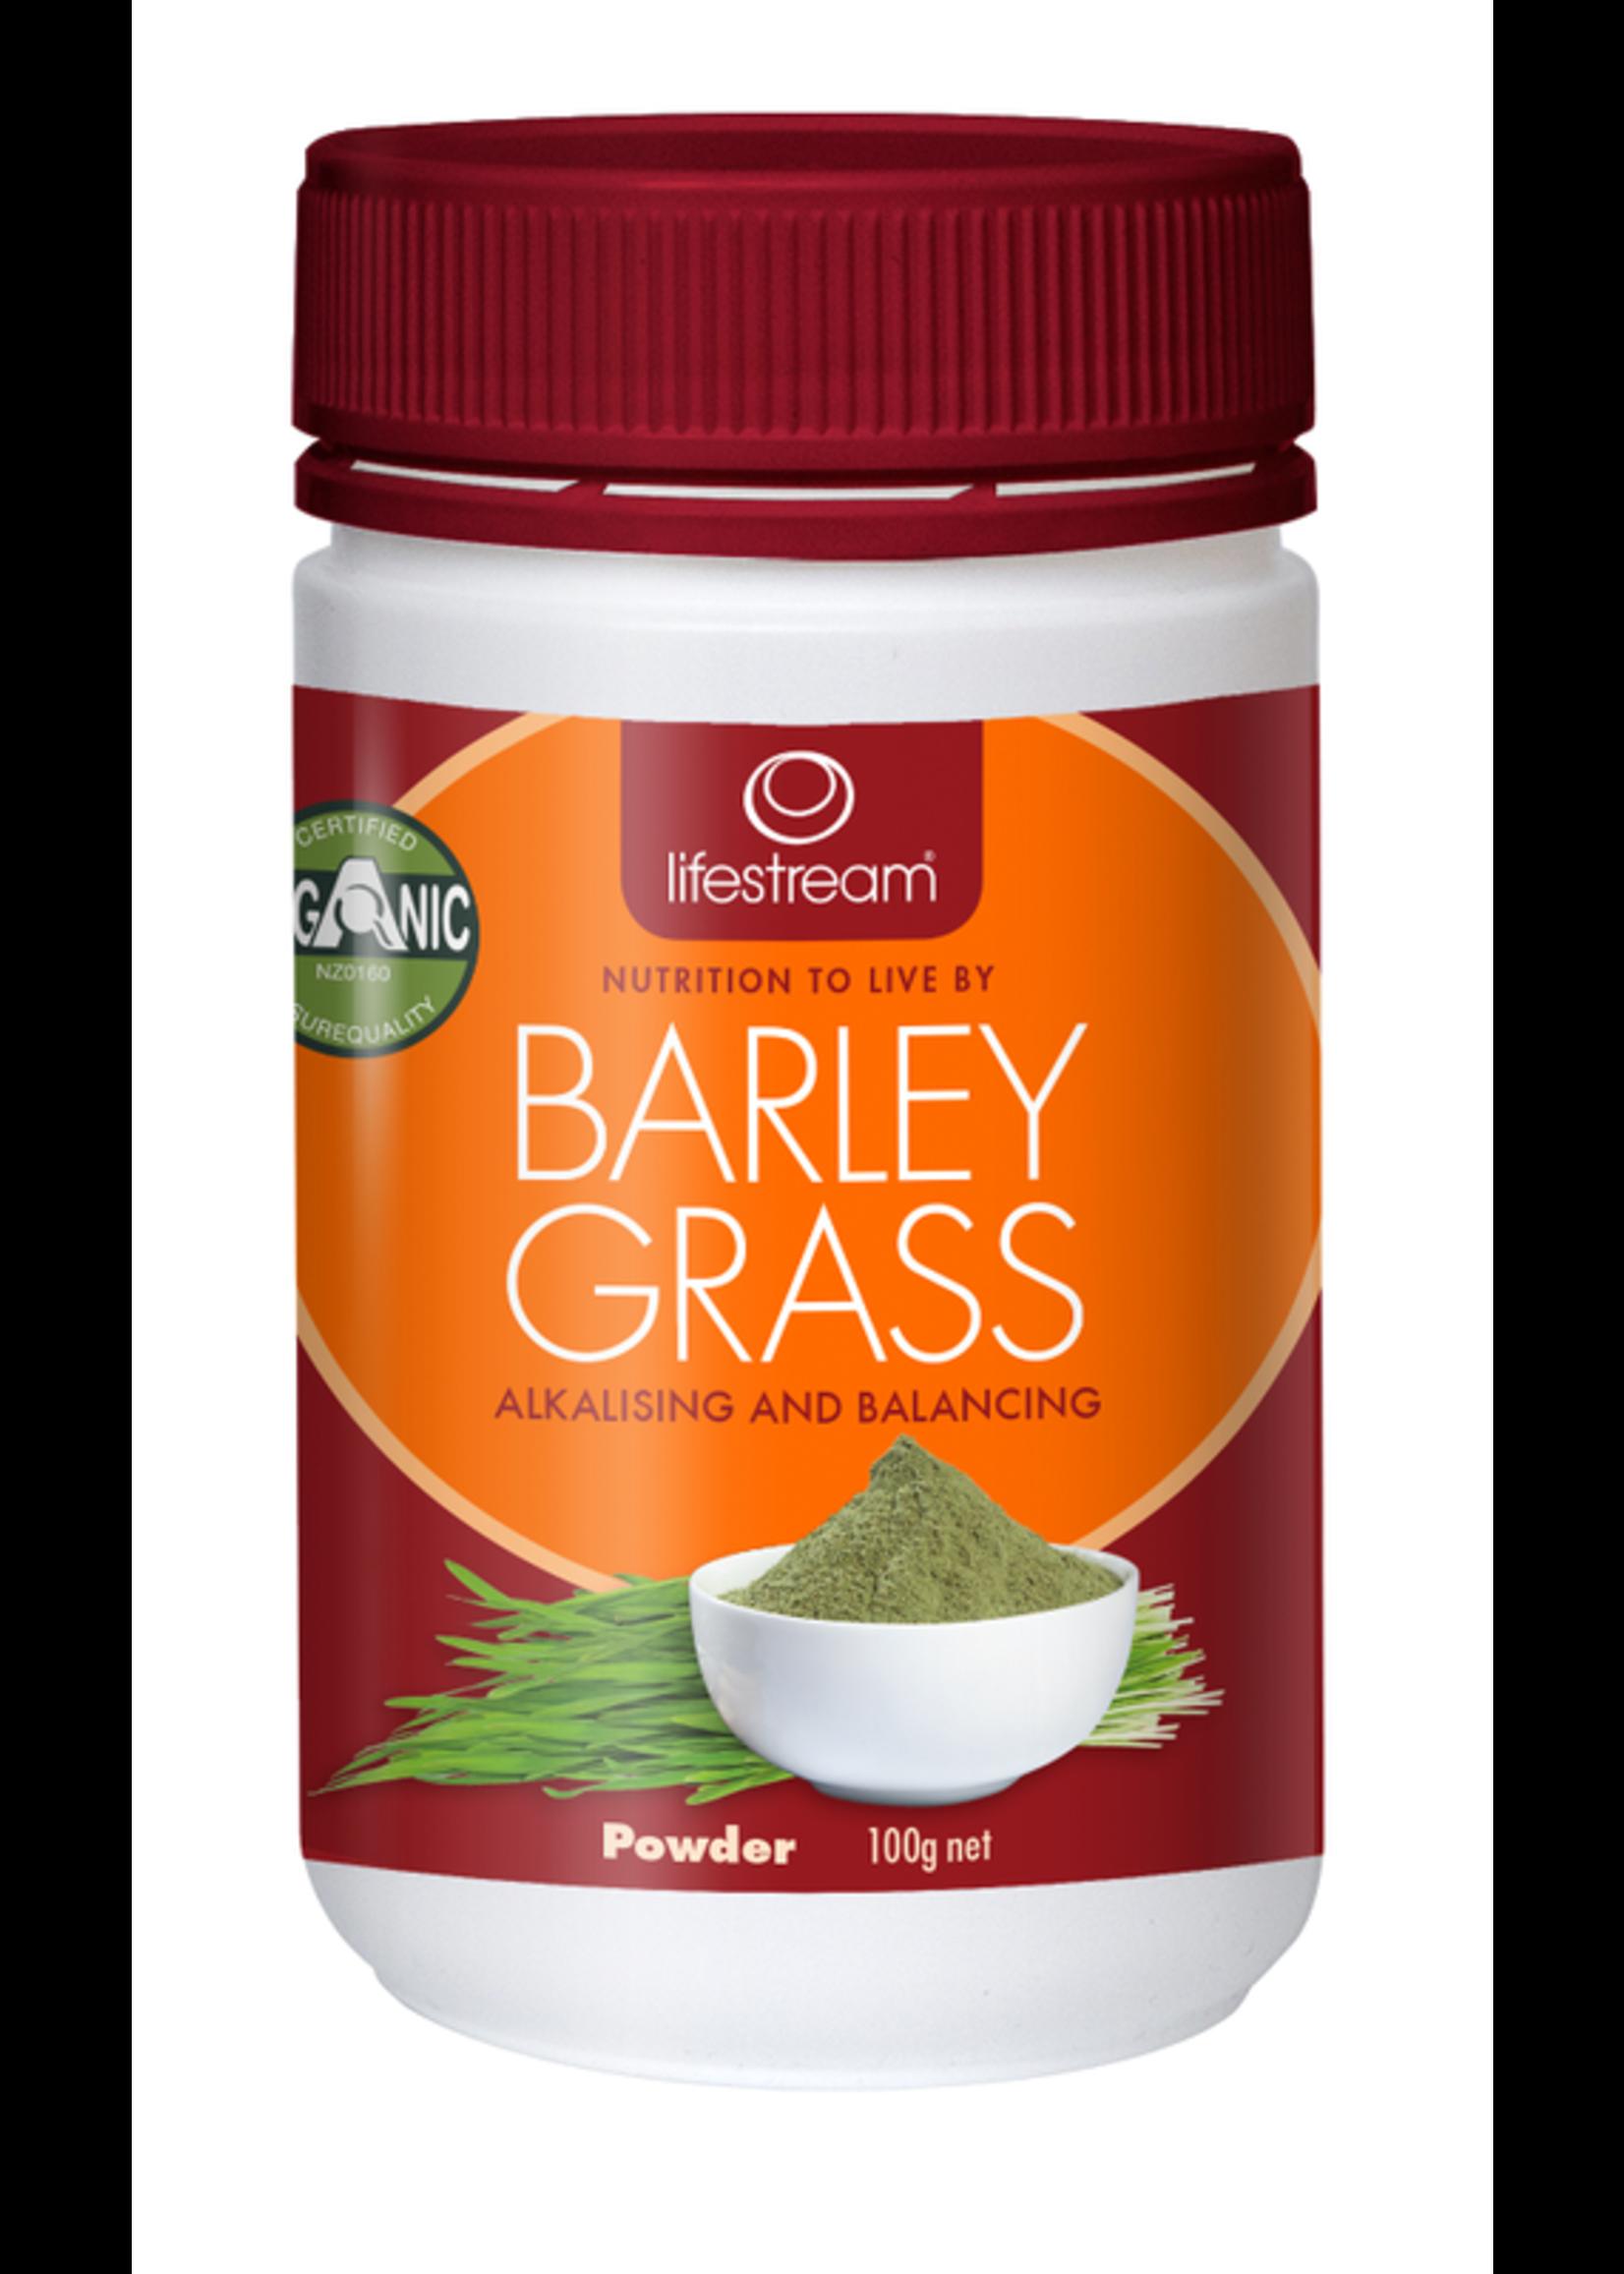 LIFESTREAM Lifestream barley grass powder 100gms